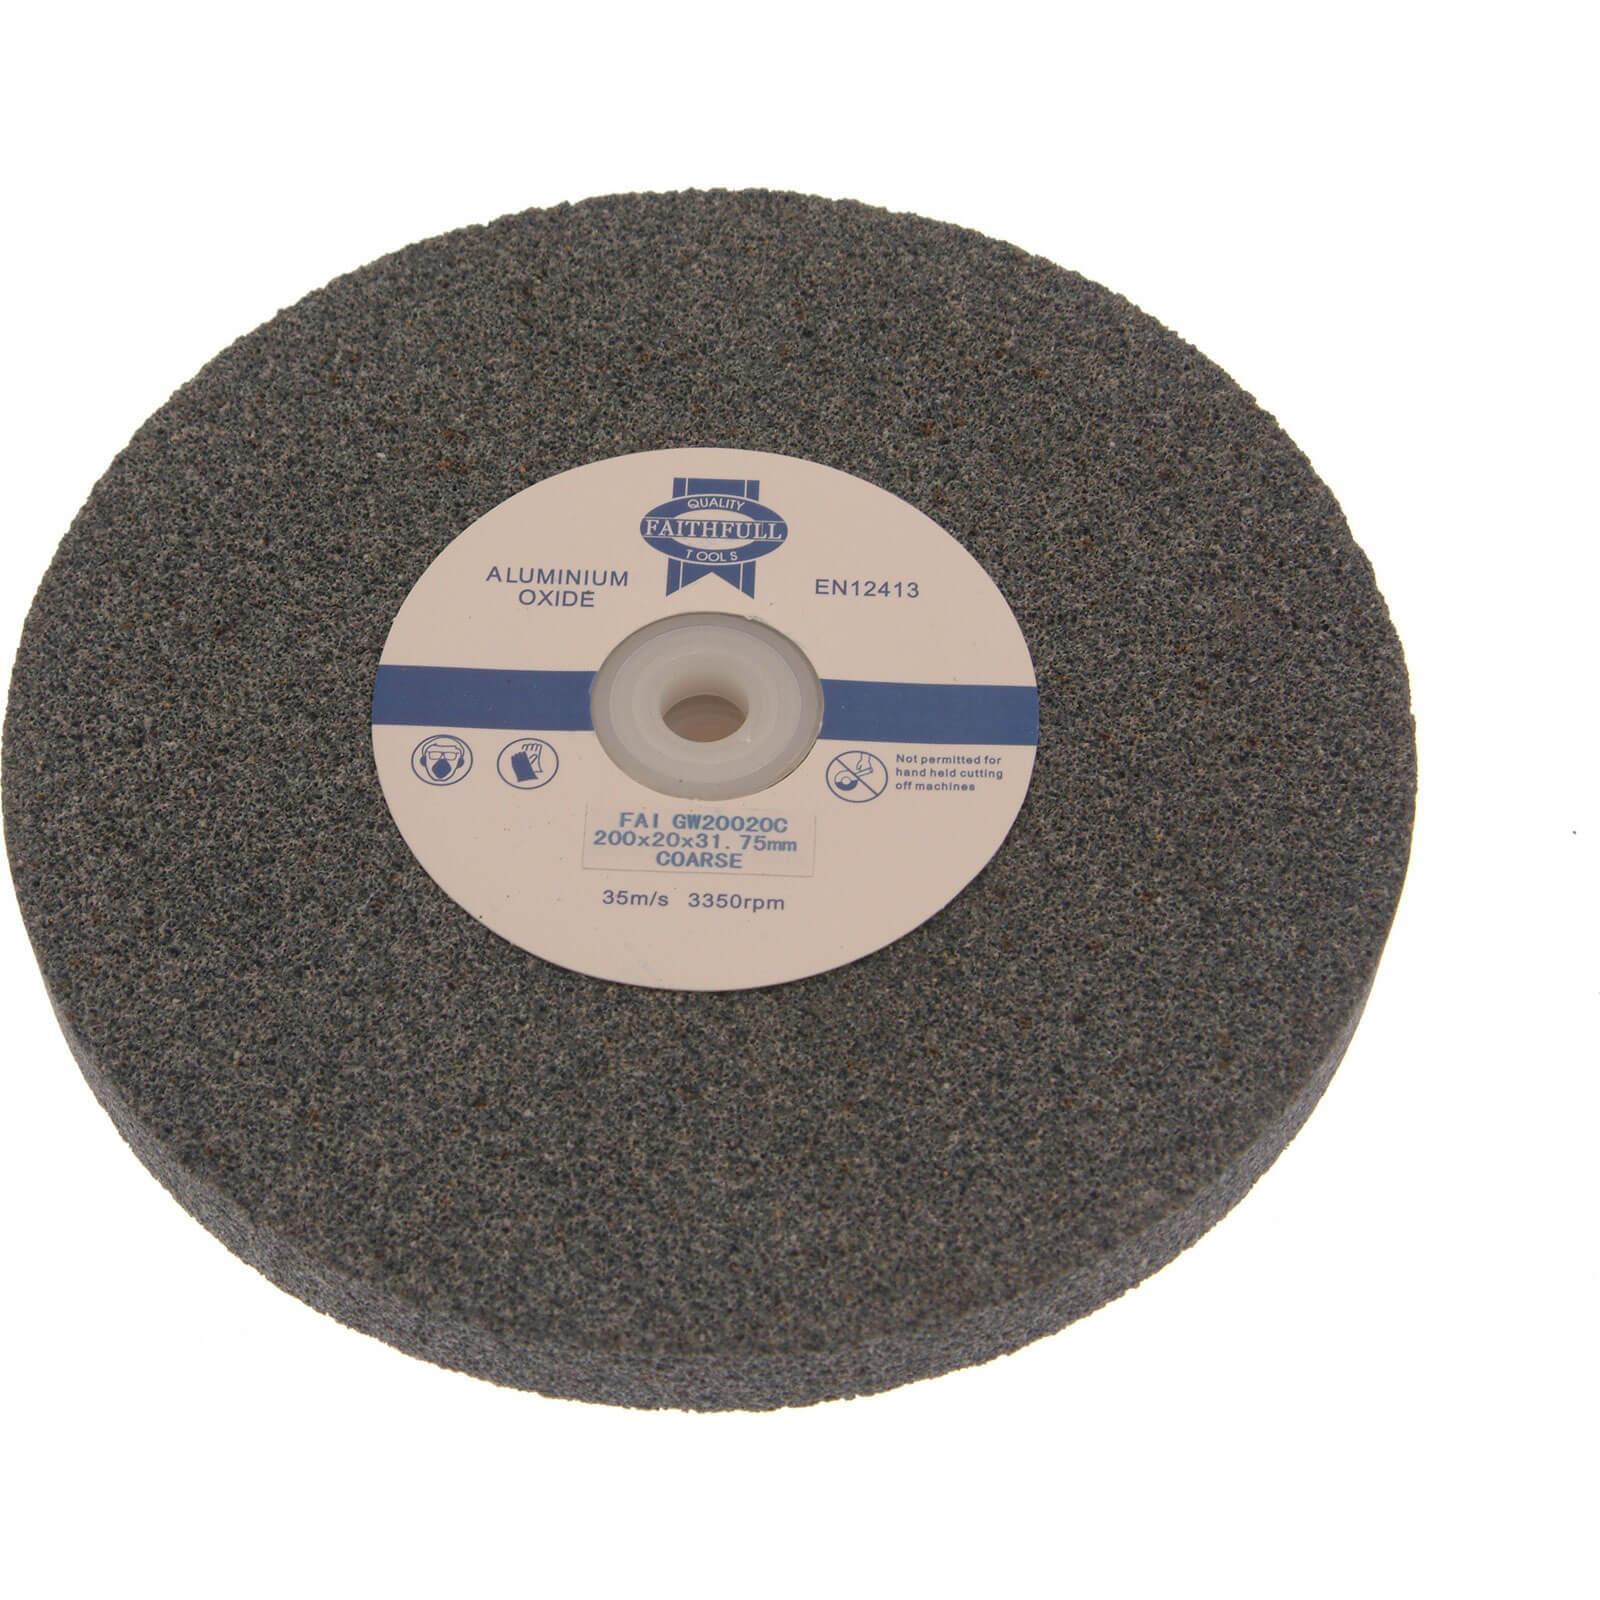 Image of Faithfull Aluminium Oxide Grinding Wheel 125mm 13mm Coarse